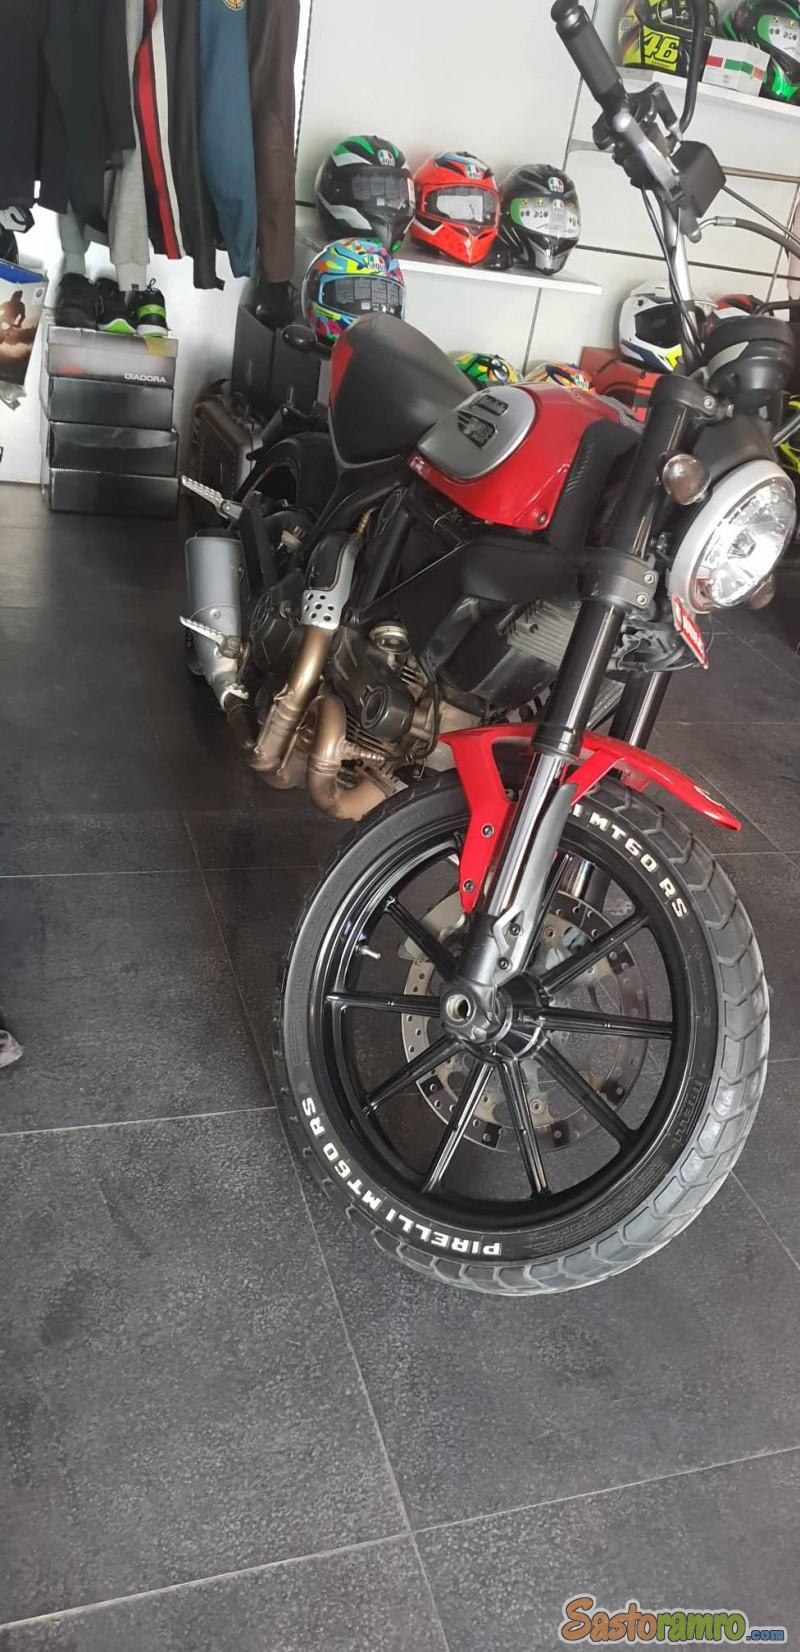 Ducati Scrambler 2016 for sale